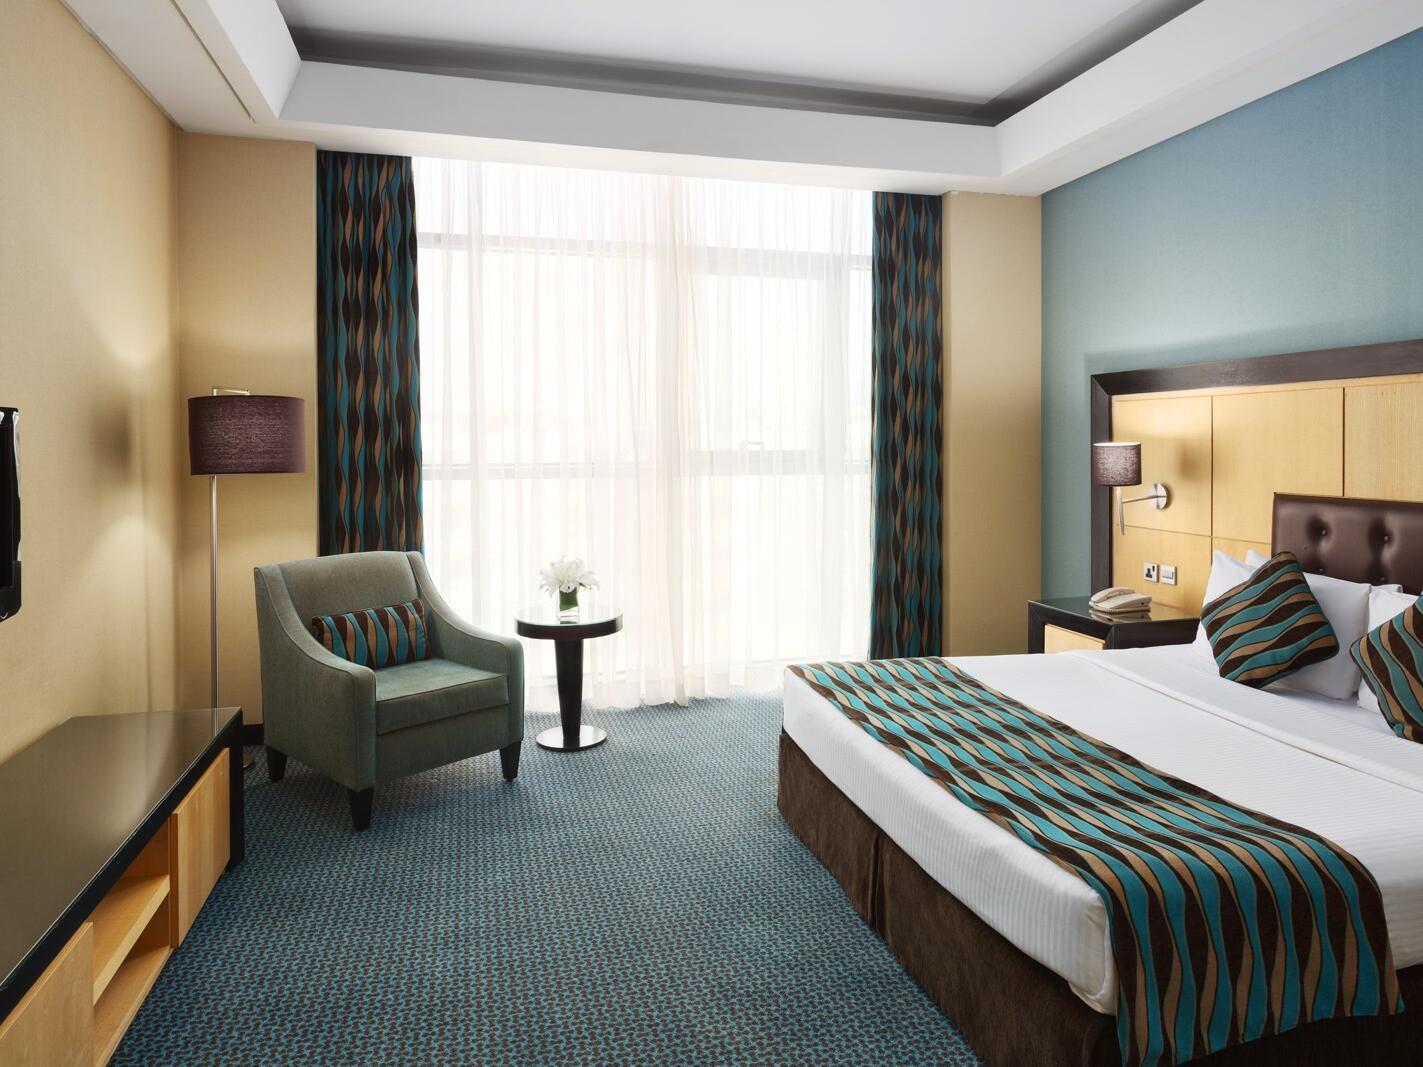 Premium Room at RAND by Wandalus in Riyadh